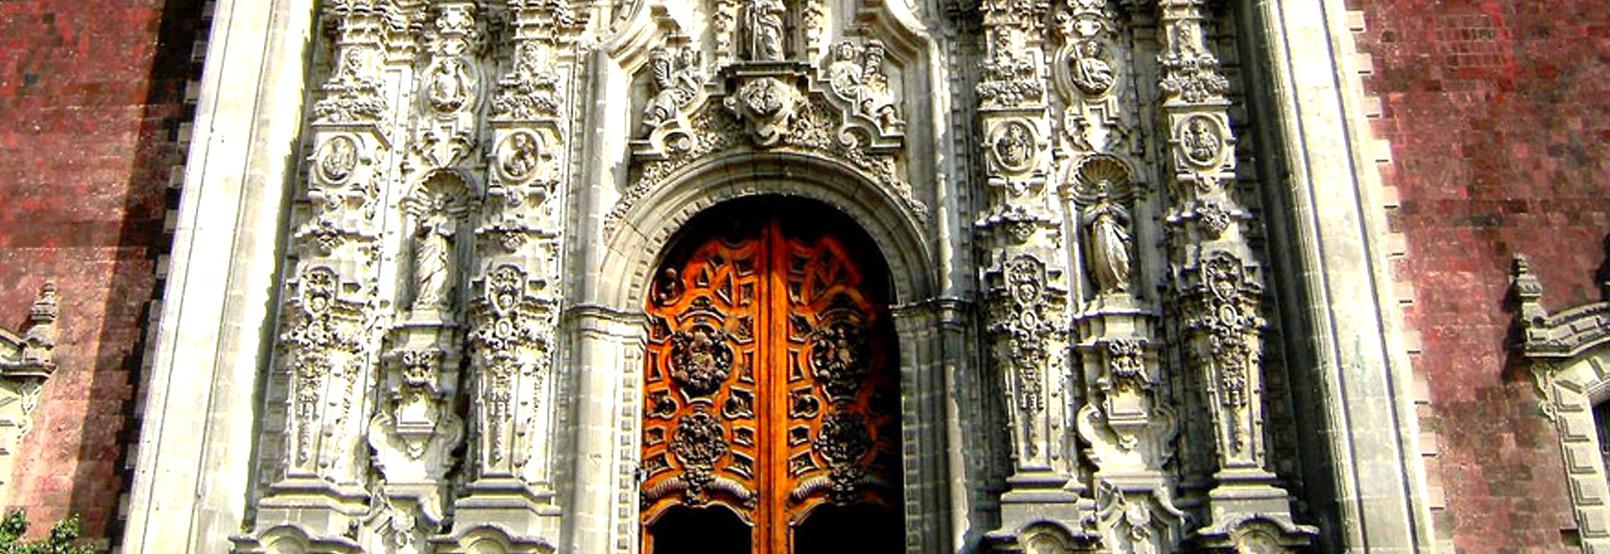 Artesanías de michoacán artesanías de michoacán